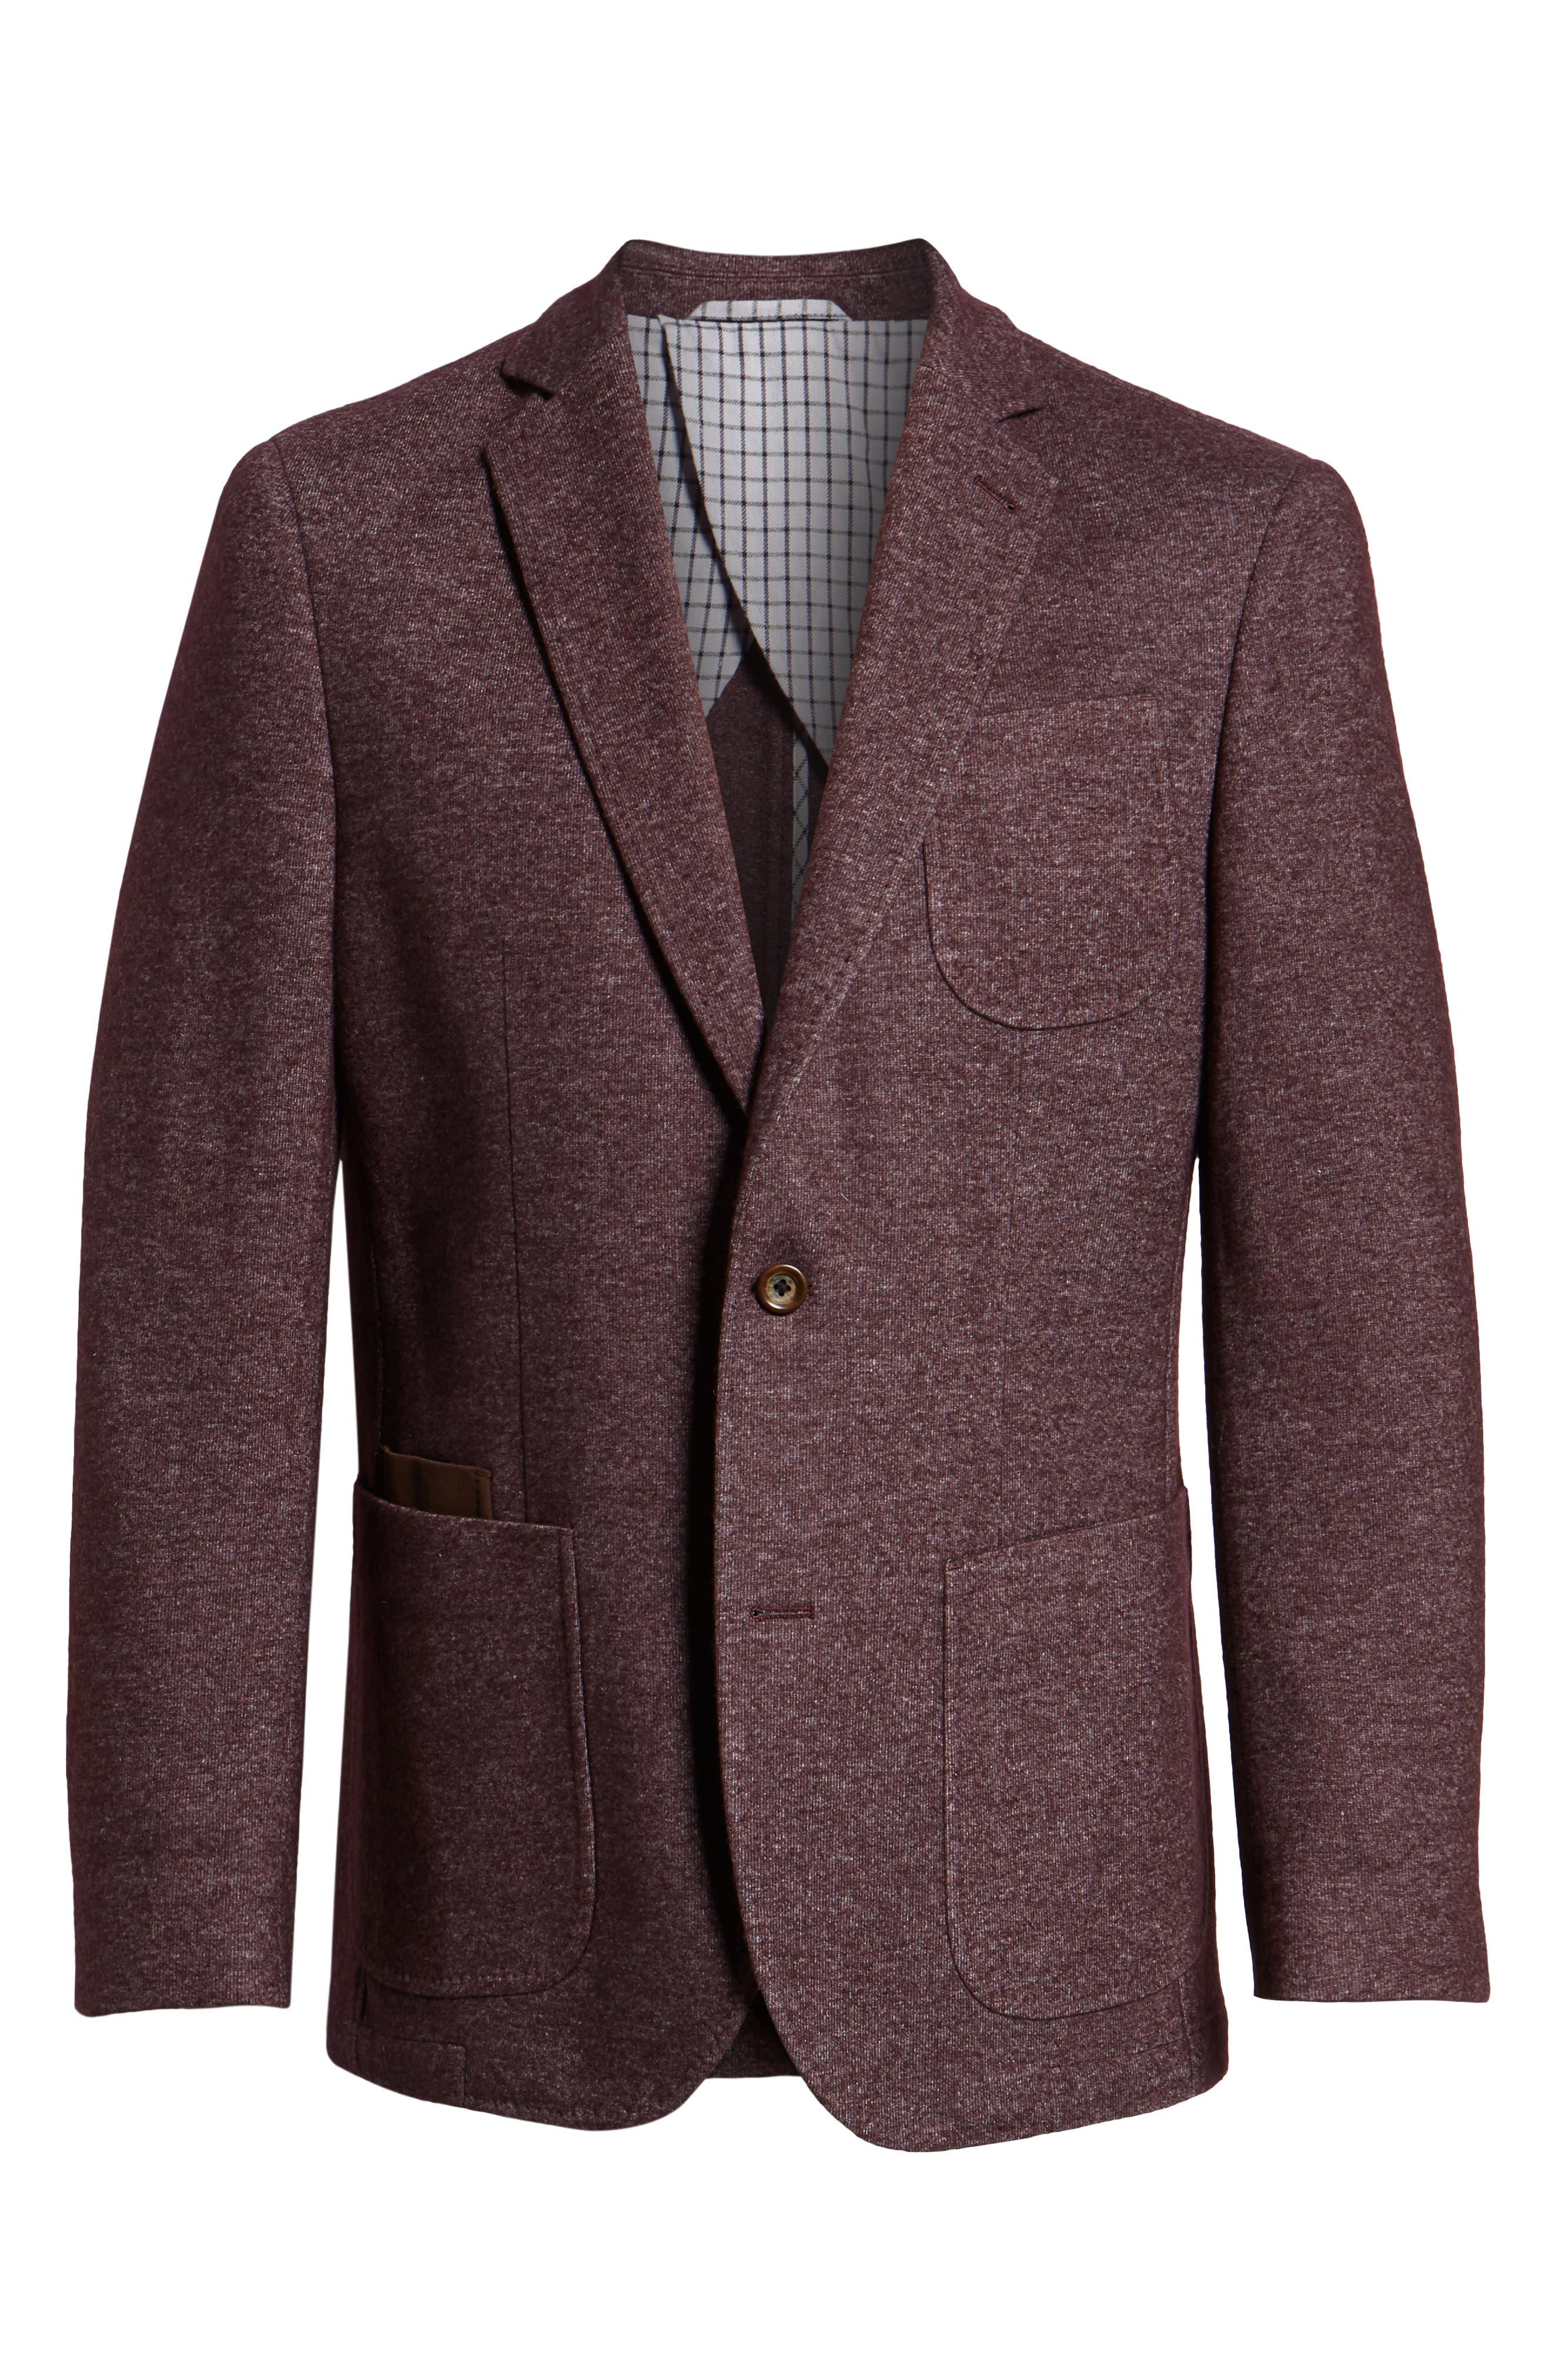 Regular Fit Knit Wool Blend Sport Coat,                             Alternate thumbnail 5, color,                             PORT